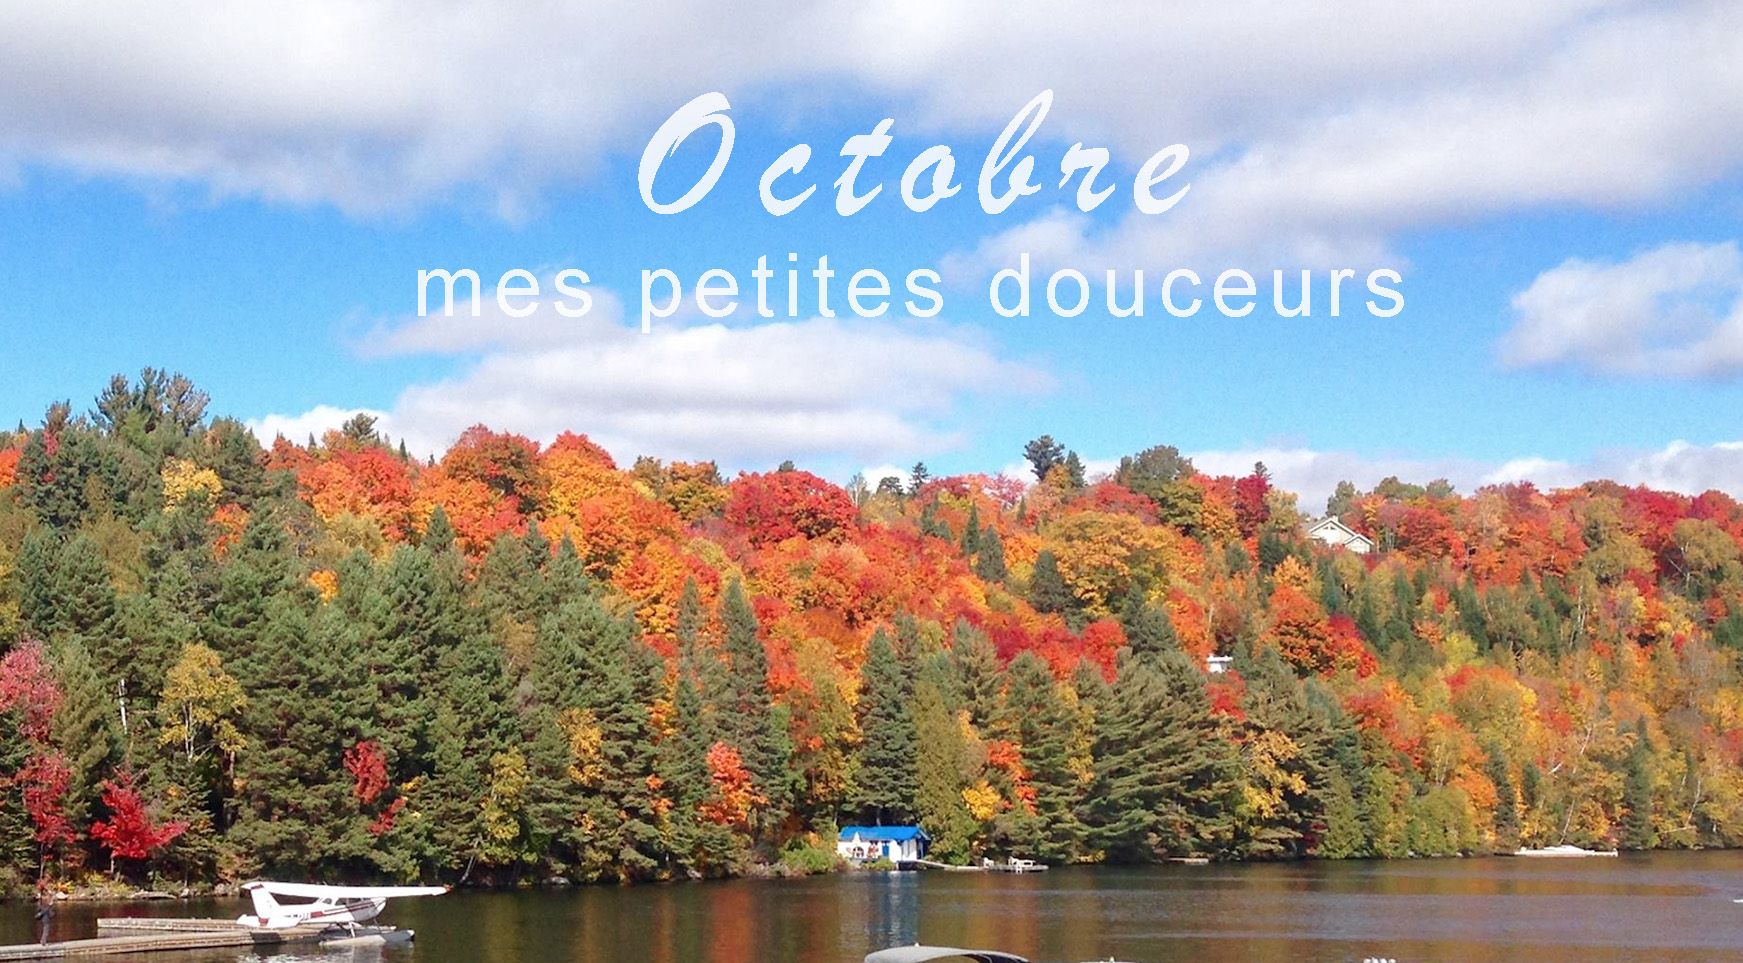 Douceurs d'octobre